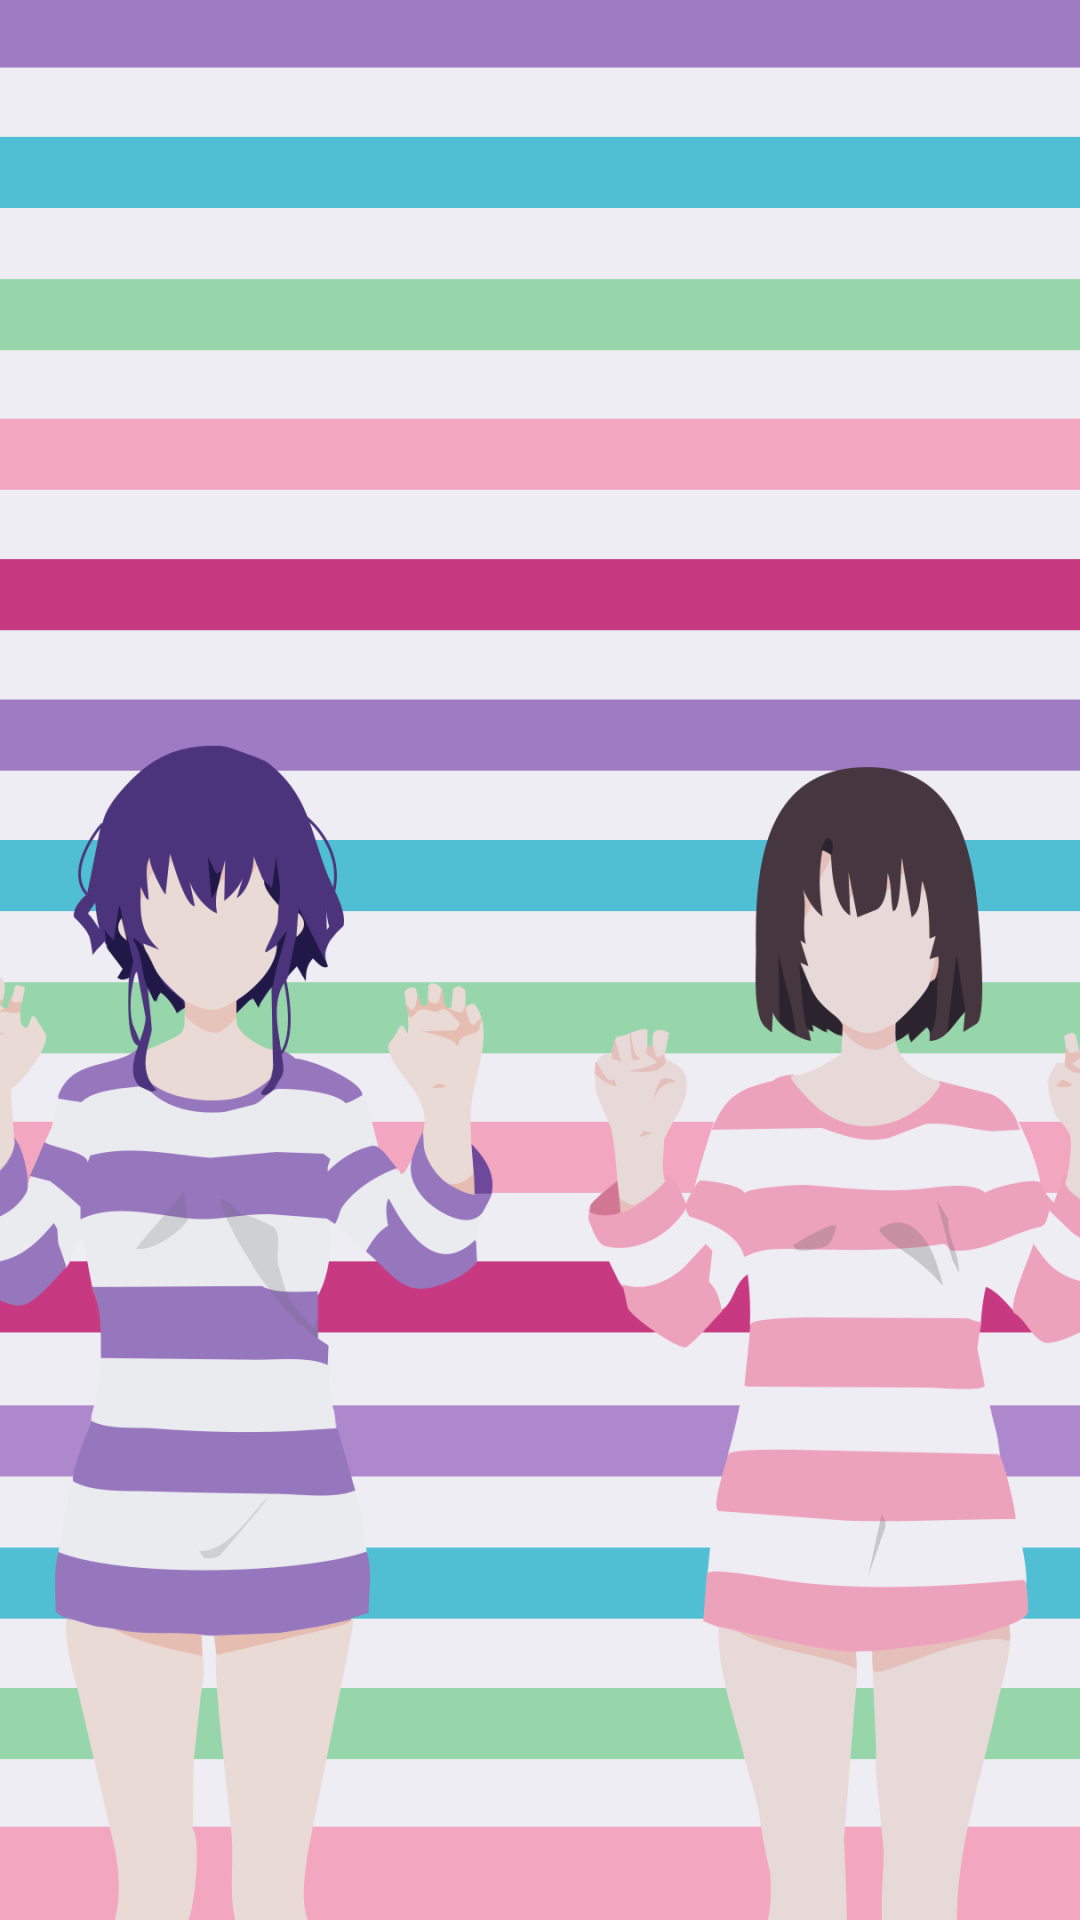 Wallpaper 731259